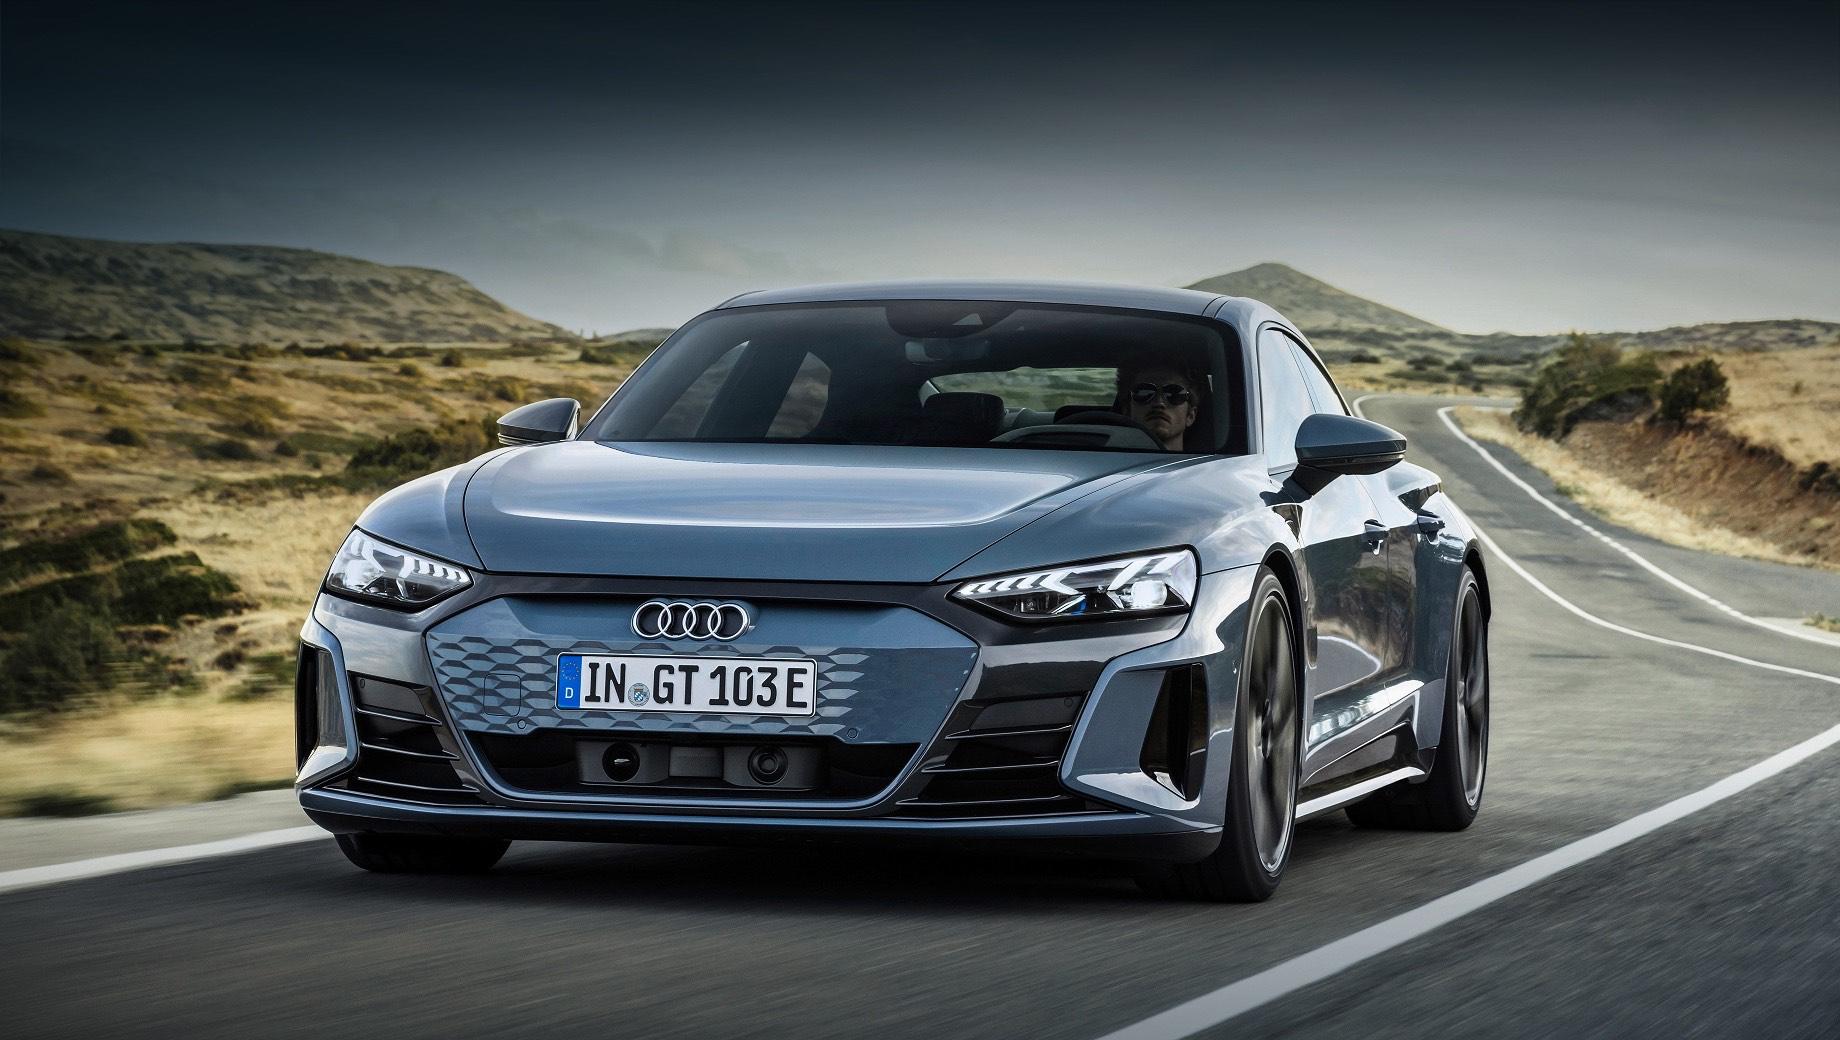 Седан Audi e-tron GT стал первым электрокаром RS-серии